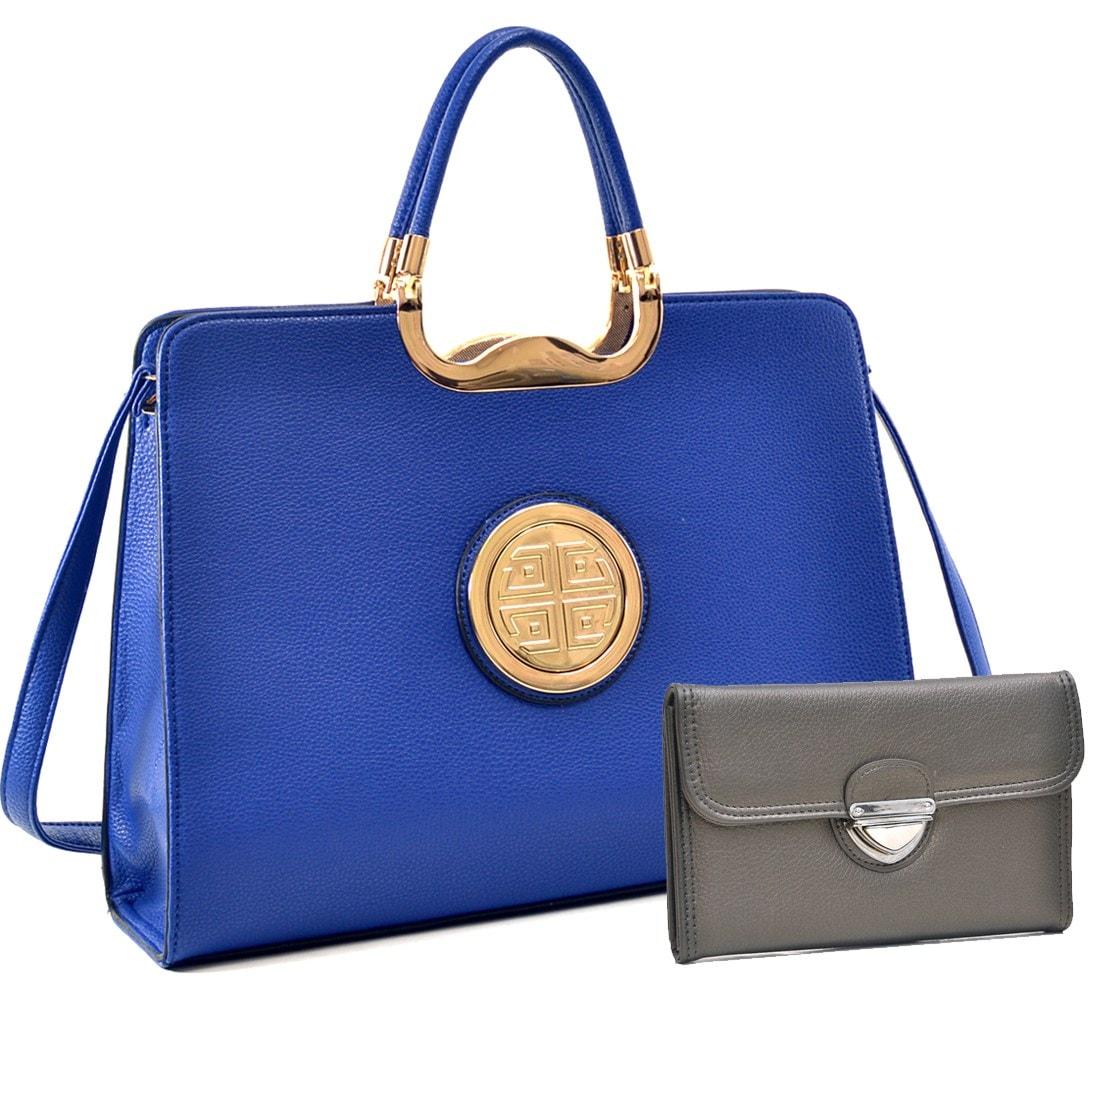 Bright blue box bag big enough for a laptop